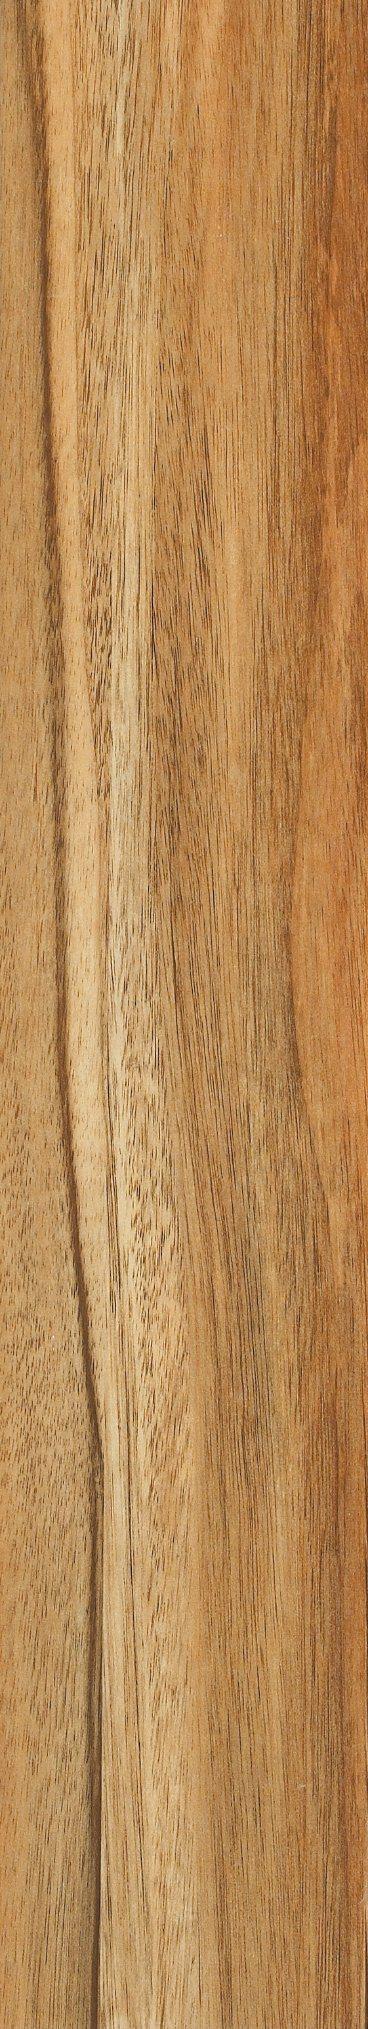 Mf815217 Wooden Pattern Floor Tile Living-Room/Kitchen Floor Tile Antique/ Rustic Surface